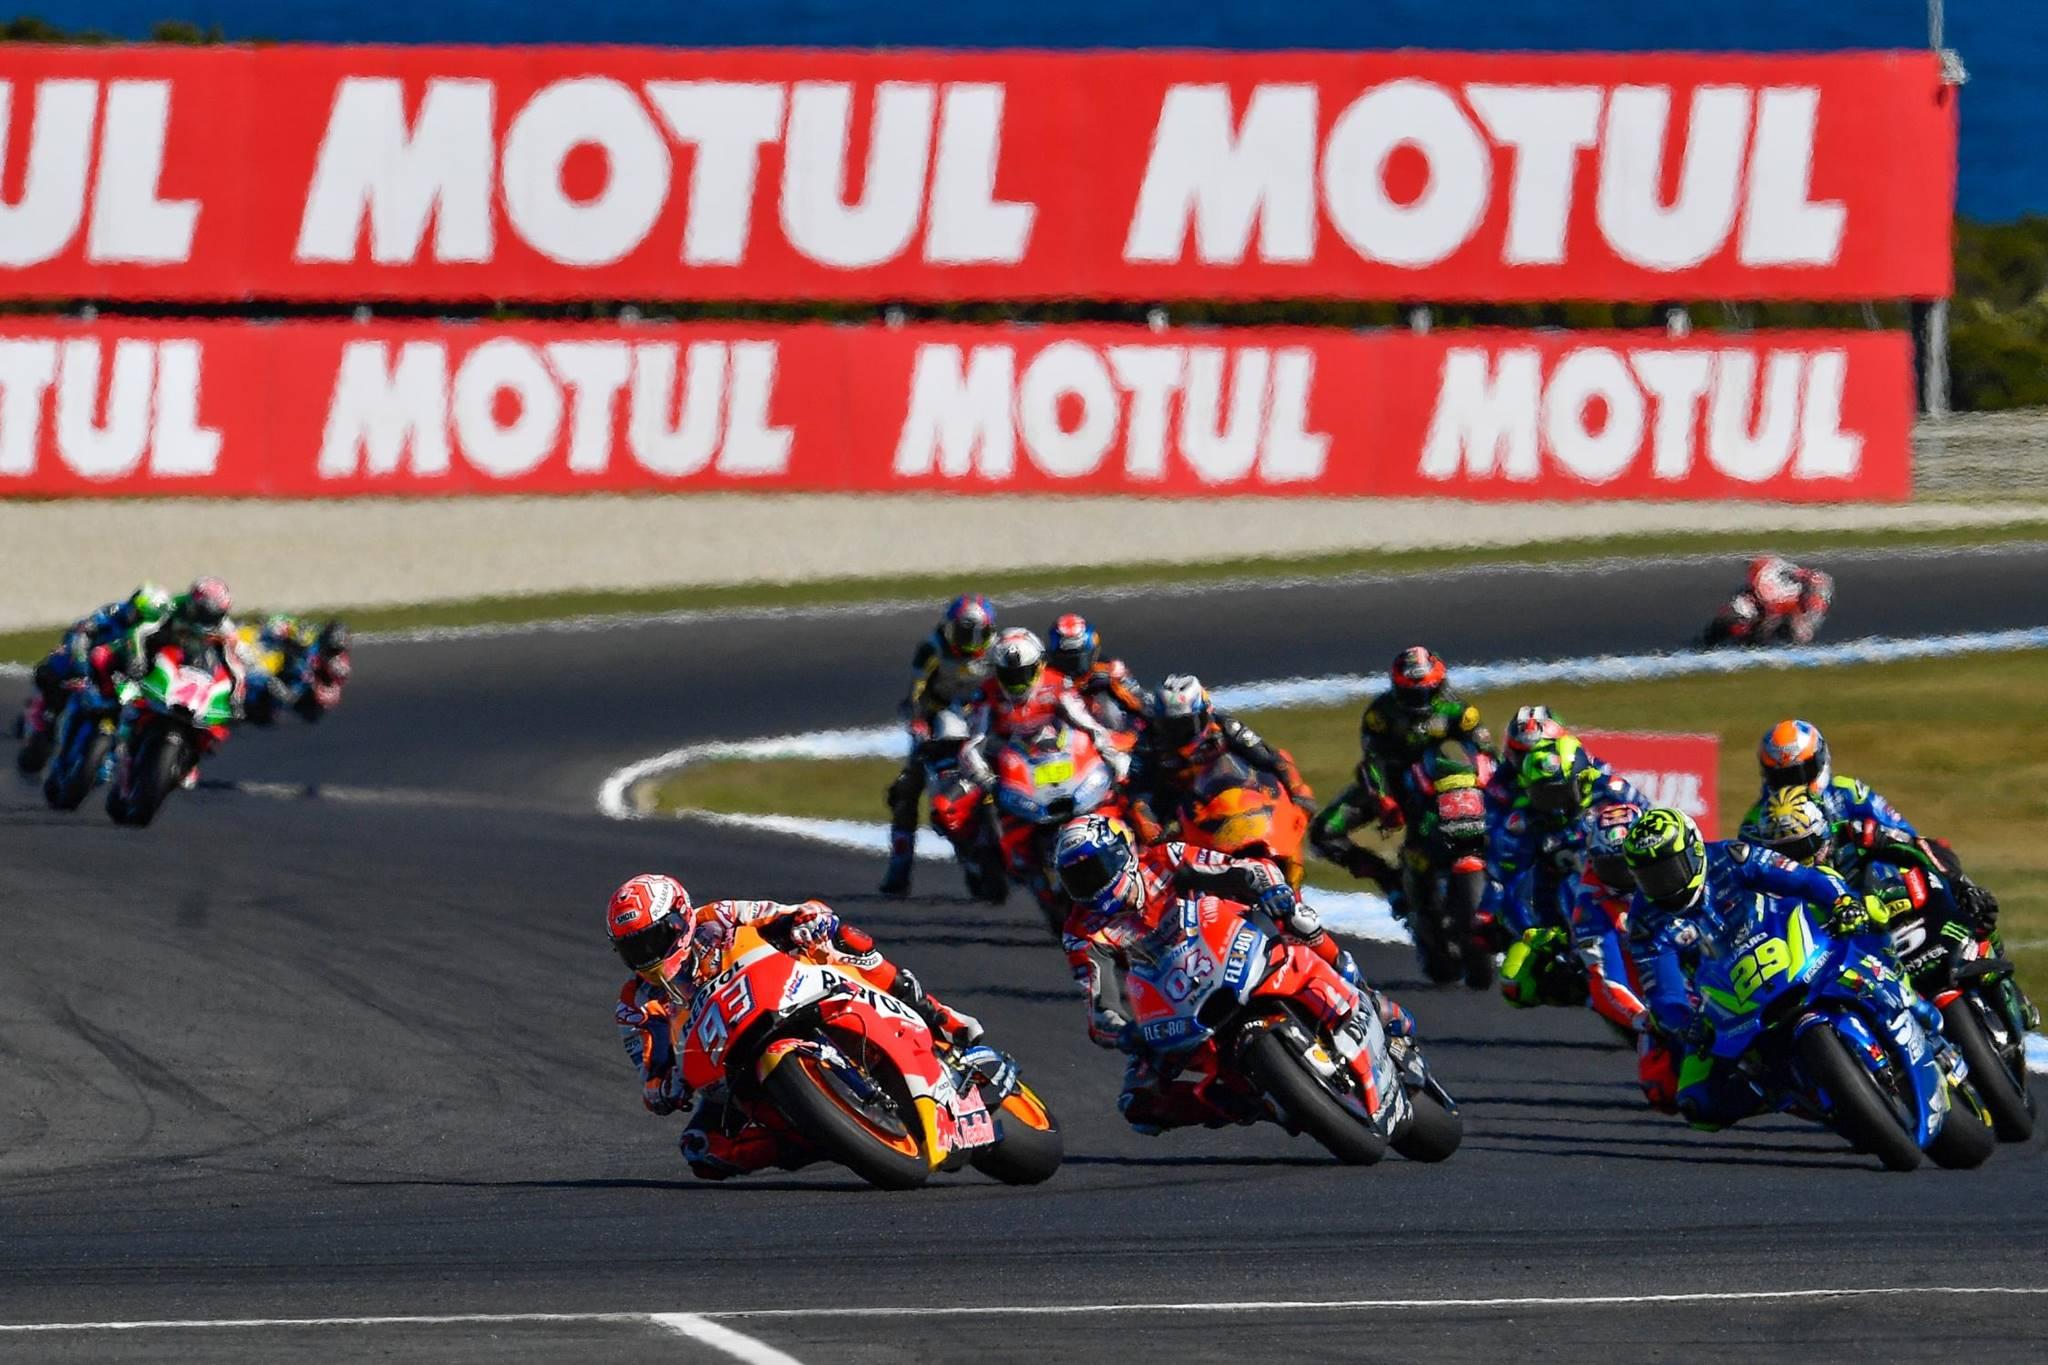 MotoGP_2018_AustralianGP_Xe_Tinhte_010.jpg